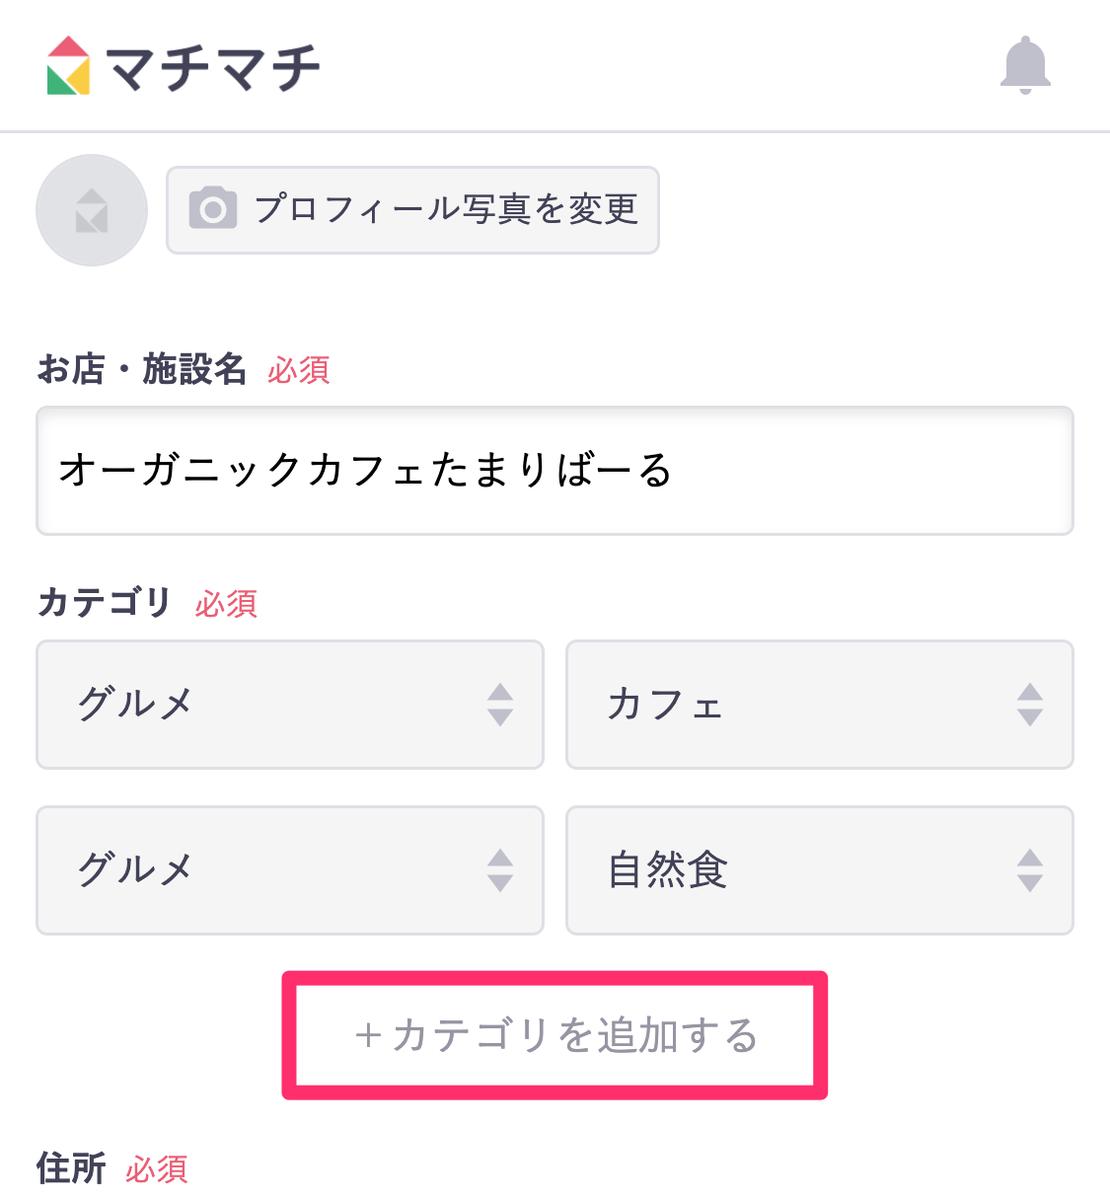 f:id:akikoasai:20200409004026p:plain